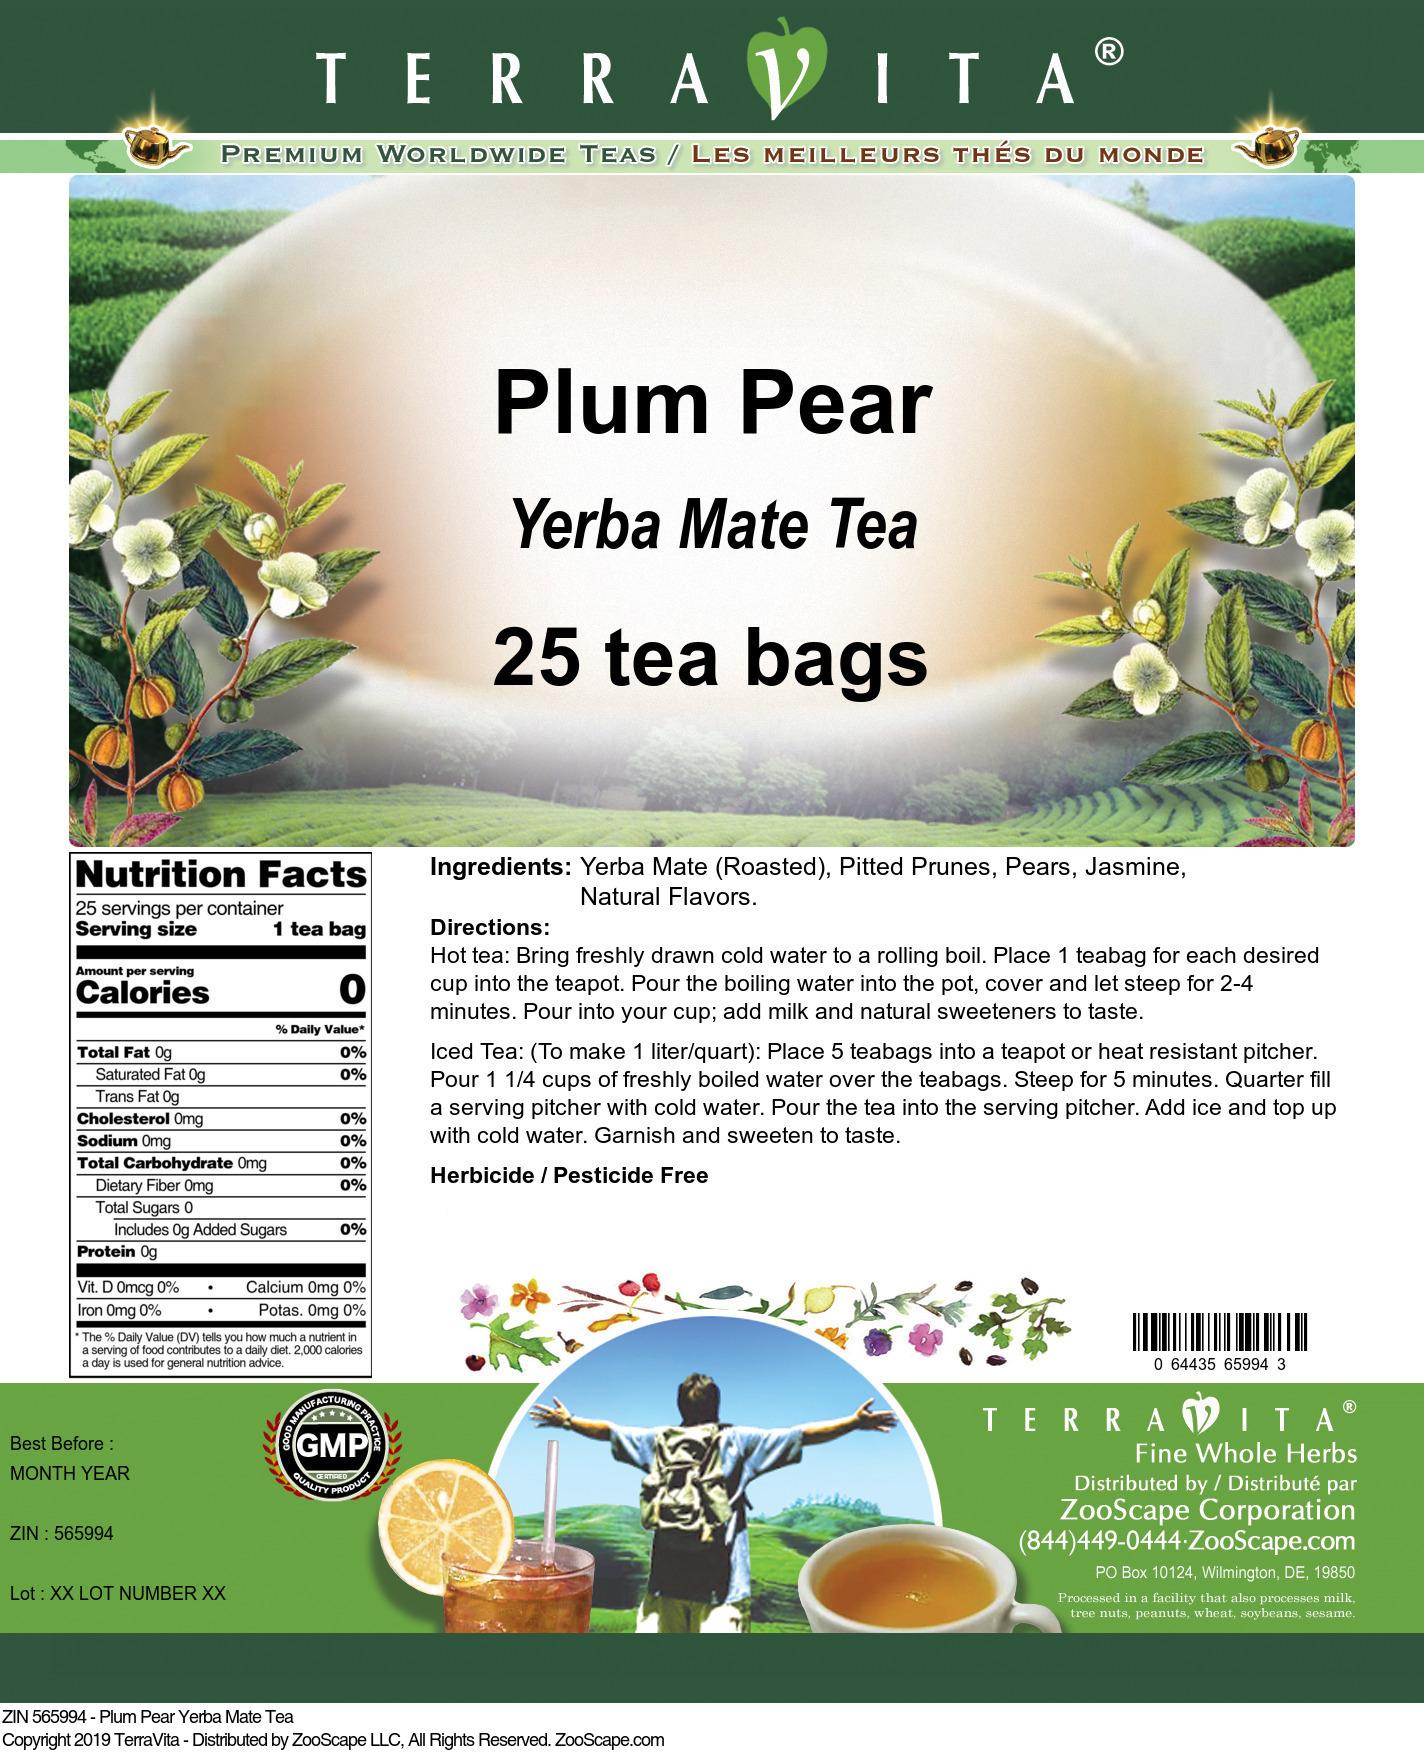 Plum Pear Yerba Mate Tea